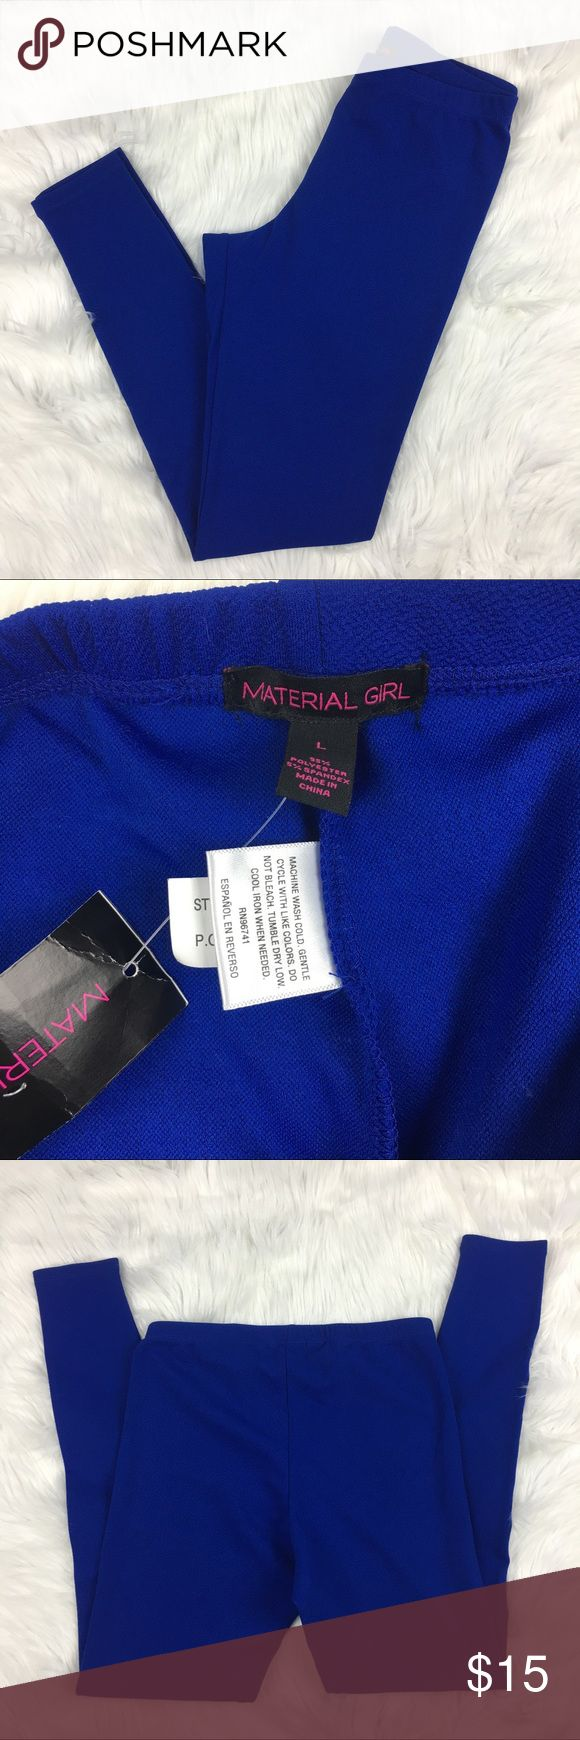 Material Girl Blue Leggings size L NWT Royal blue leggings by Material Girl. Size L. New with tags. Material Girl Pants Leggings